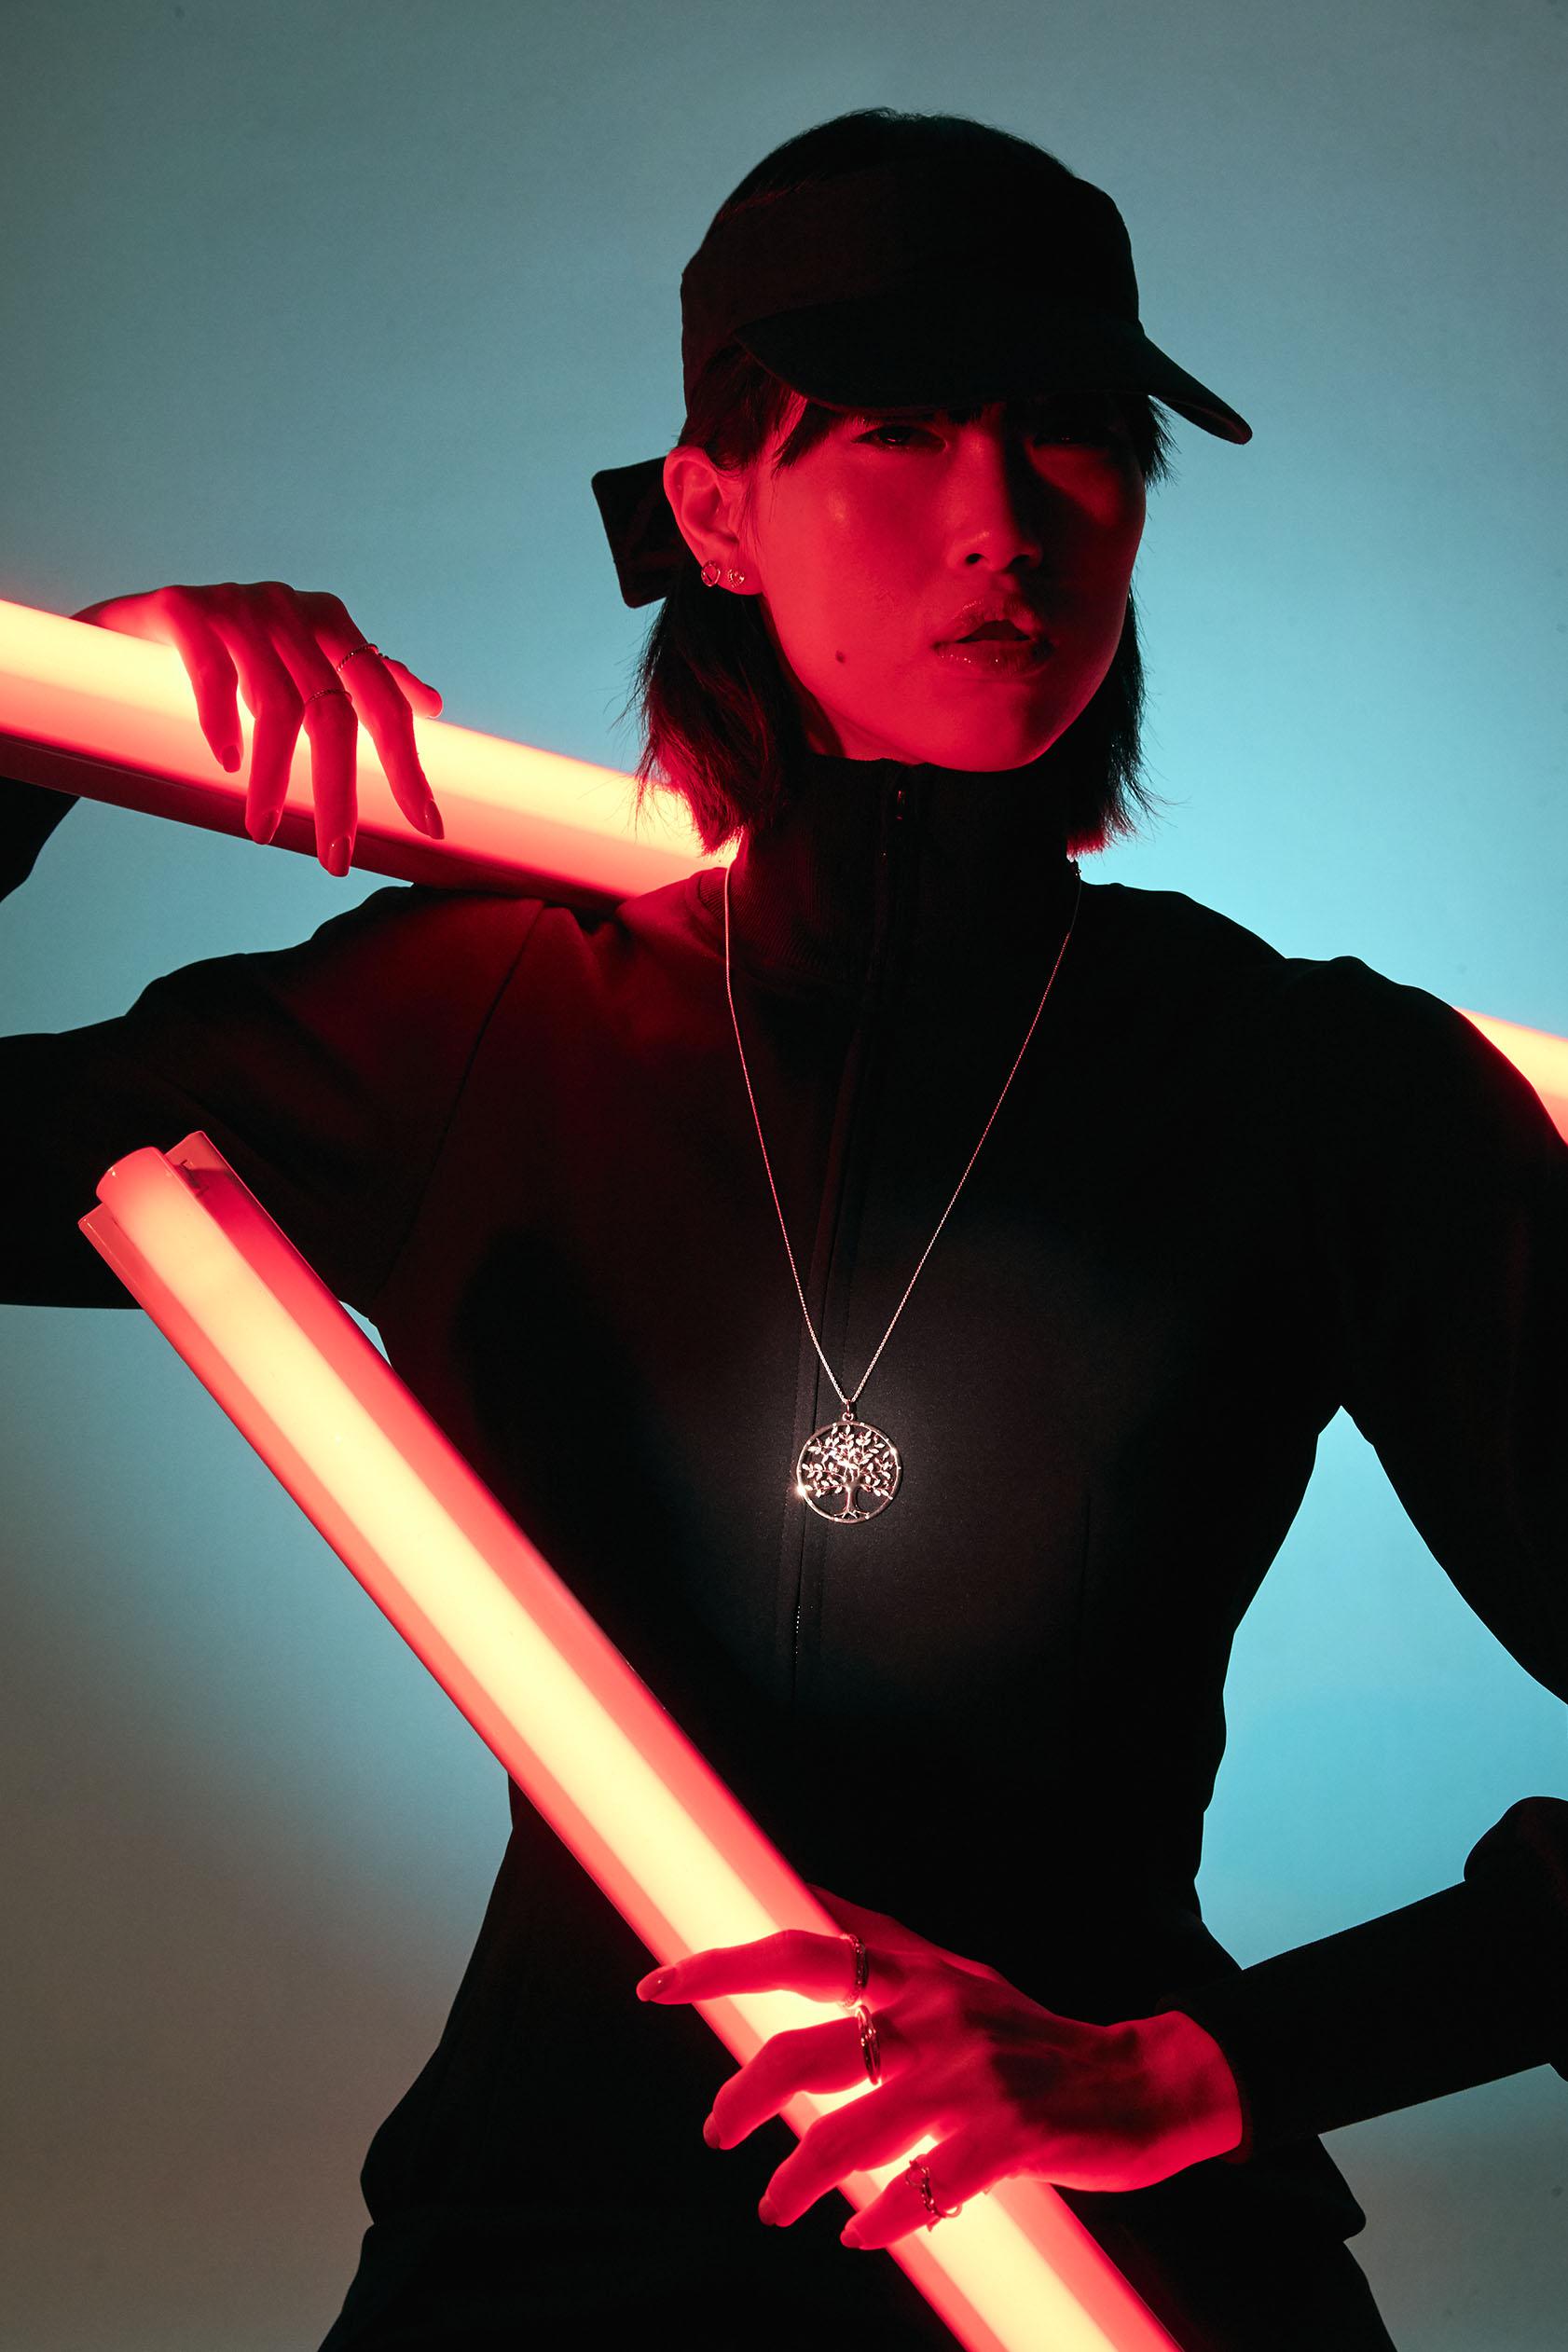 Thomas Sabo #fashionjewelry, #luxurylifestyle #fashionacessories #frackeye #gordonlund #jewelryphoto